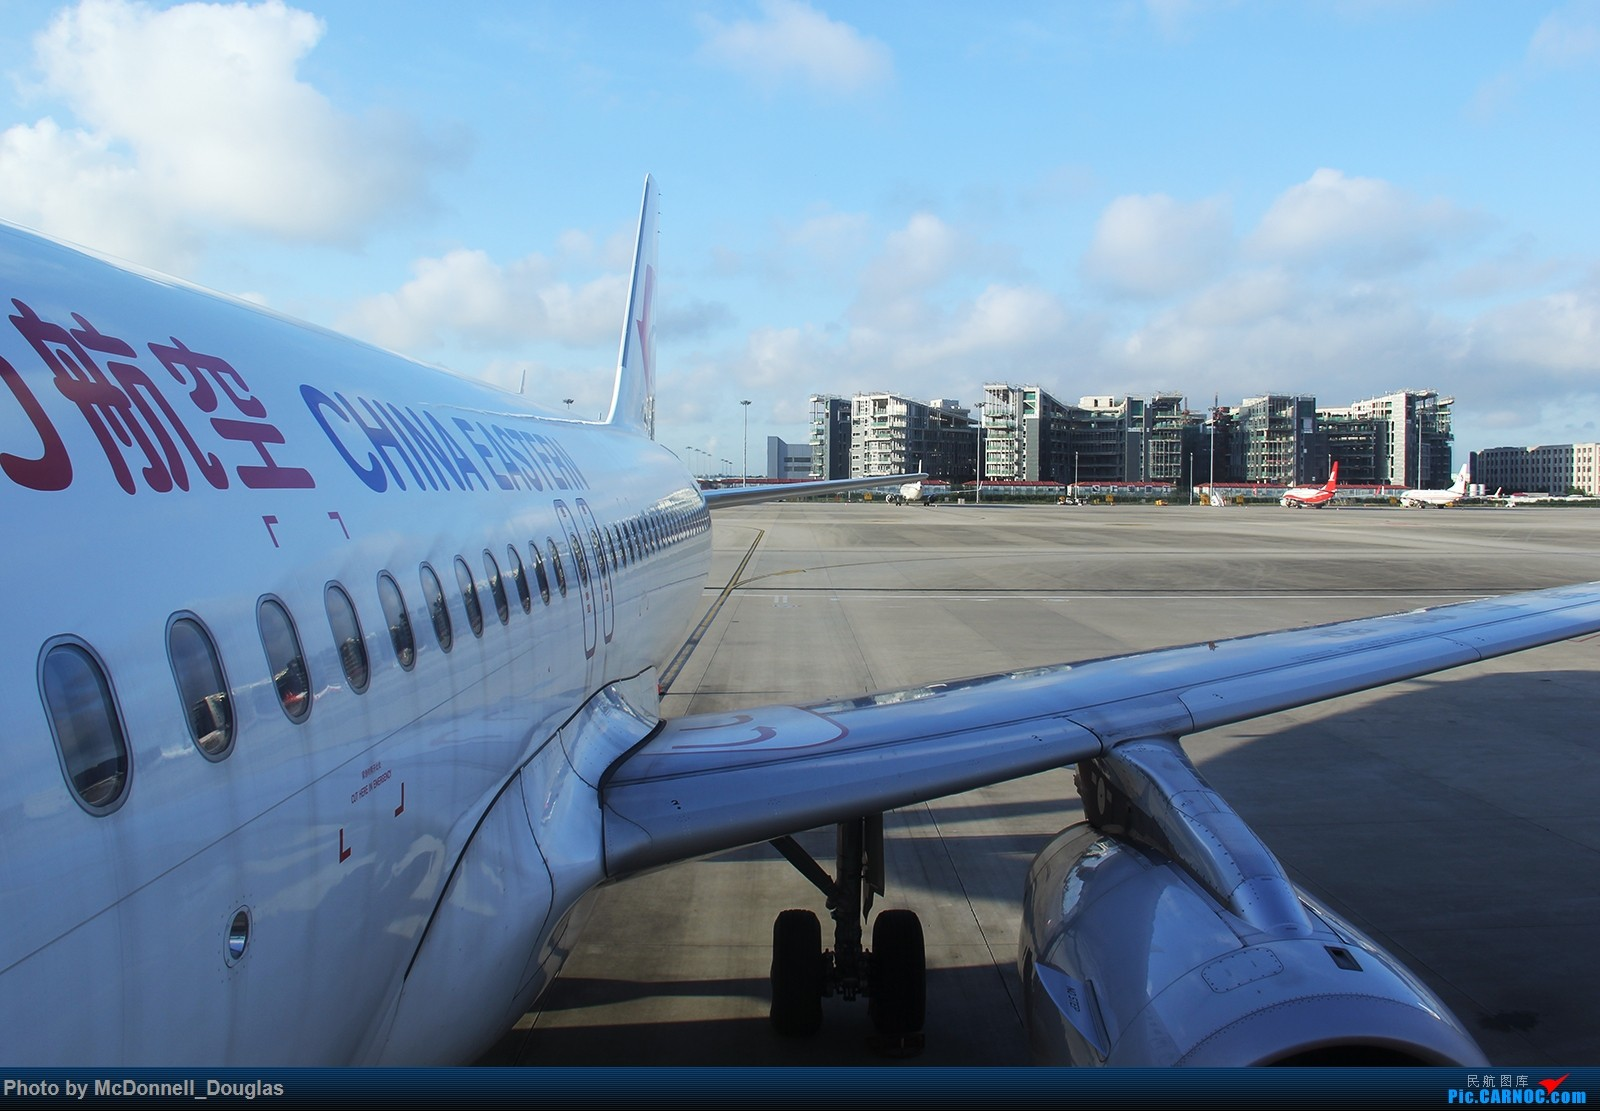 Re:[原创]【上海飞友会】【zc带你走天下(2)】再访祖辈年轻时工作的土地,父母年少时生活戈壁,跨越大半个中国去看新疆,回程小游蓉城(上) AIRBUS A320-200 B-8237 中国上海虹桥国际机场